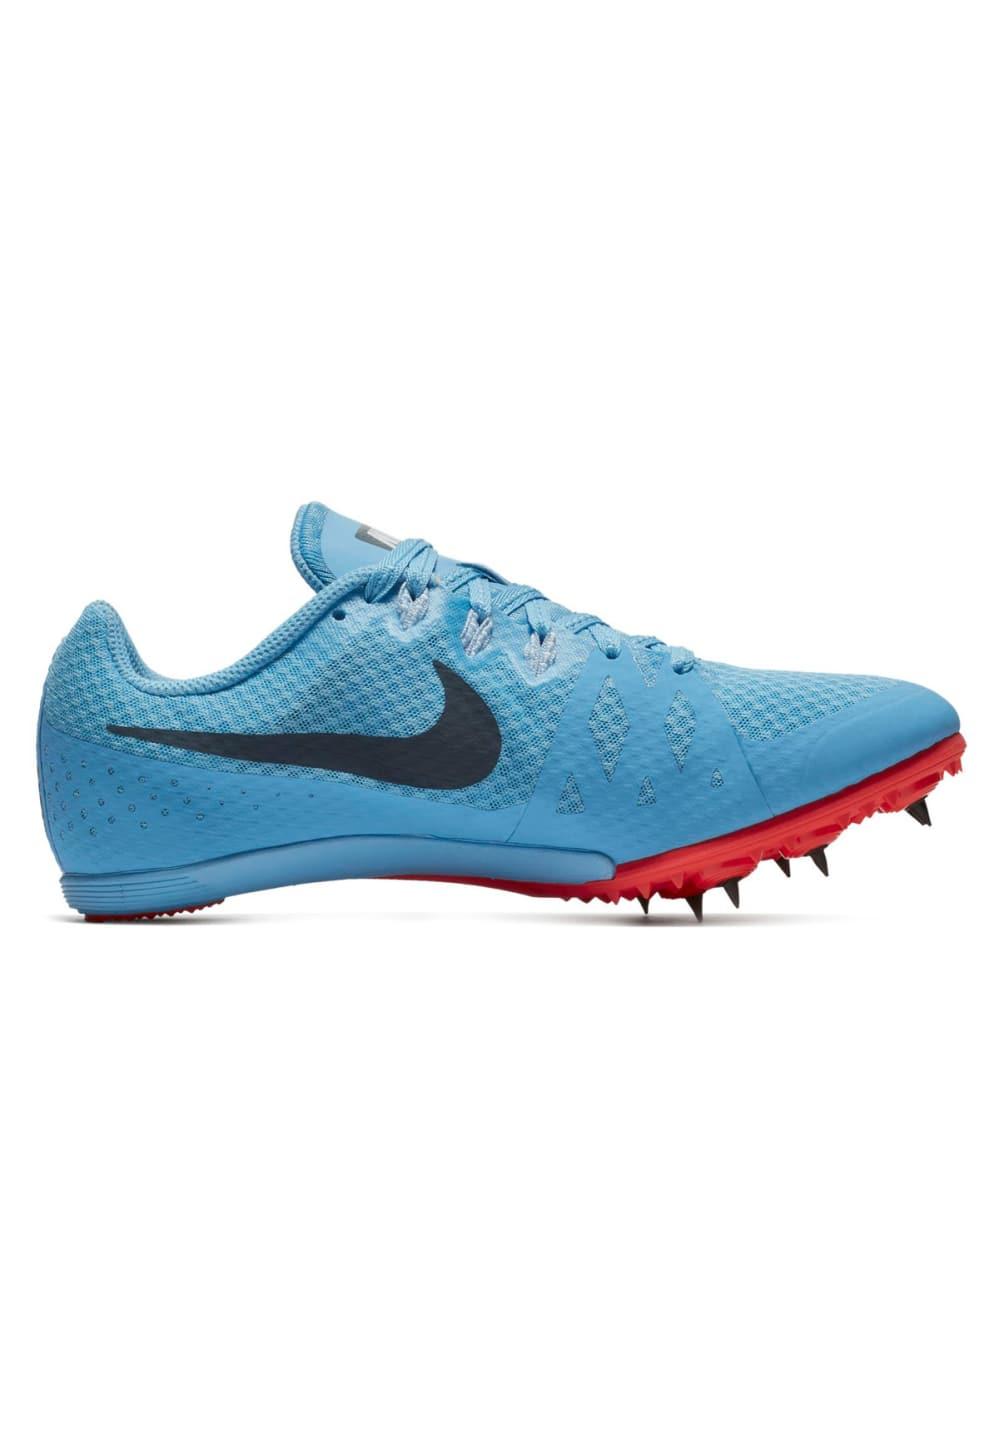 1b624e8c0304e Nike Zoom Rival MD 8 Track Spike - Spikes for Women - Blue